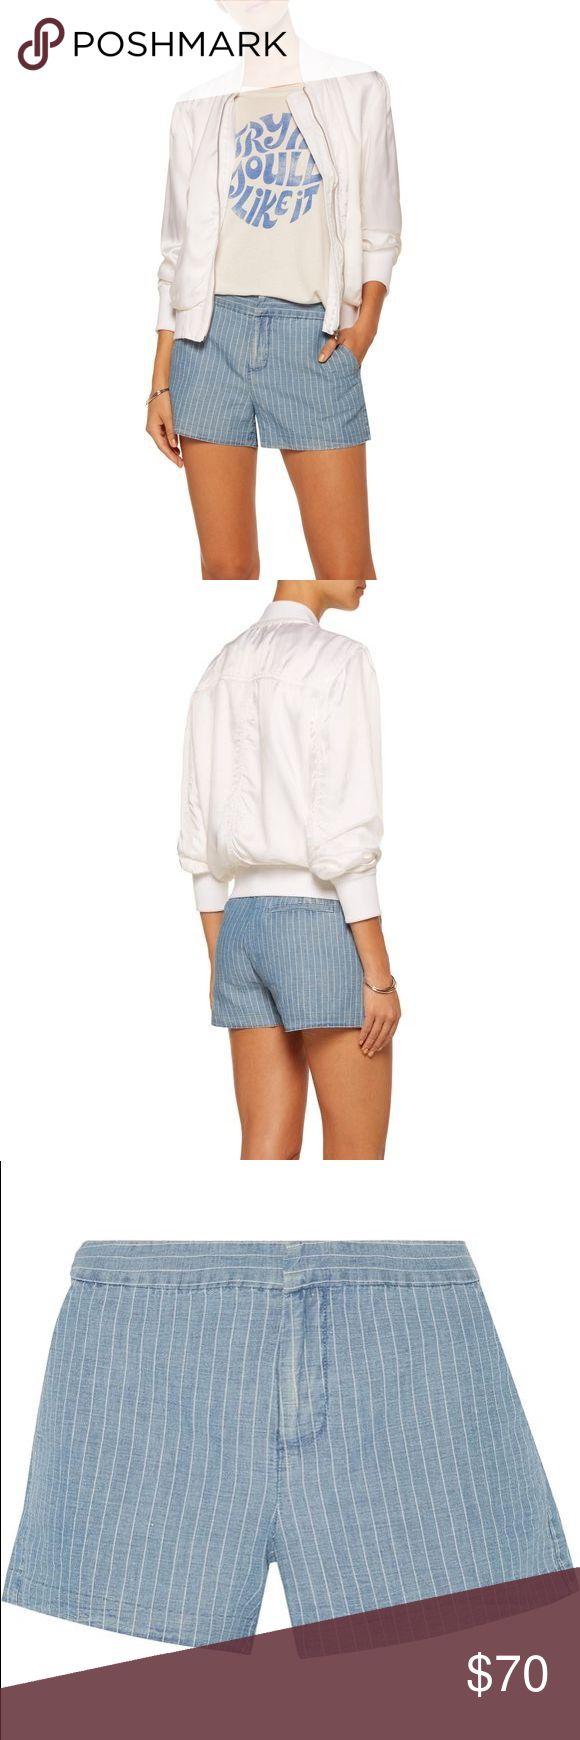 Joie Merci Linen-Blend Shorts Joie light-blue and white Merci shorts. 51% linen, 49% cotton. Washed Indigo. Joie Shorts